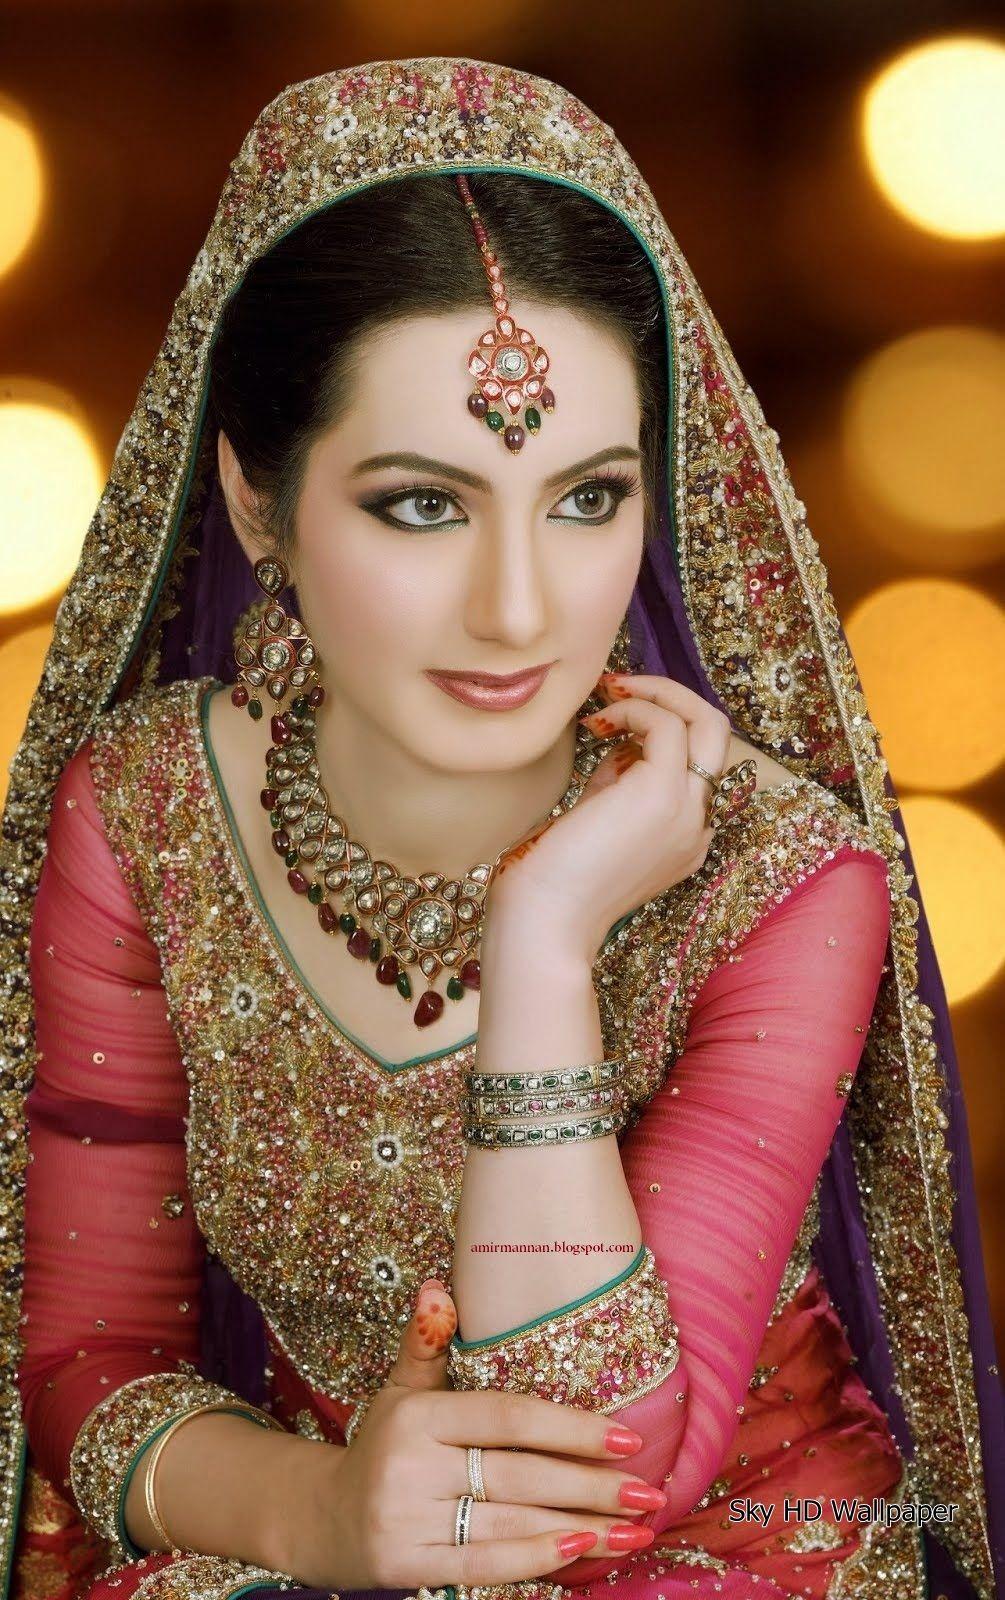 Ayyan ali bridal jeweller photo shoot design 2013 for women -  Fashion World Latest Fashion Pakistani Brides Bridal Fashion Pakistani Bridal Dresses Of Late Wedding Dresses Pakistan Work And Latest Bridal Walima